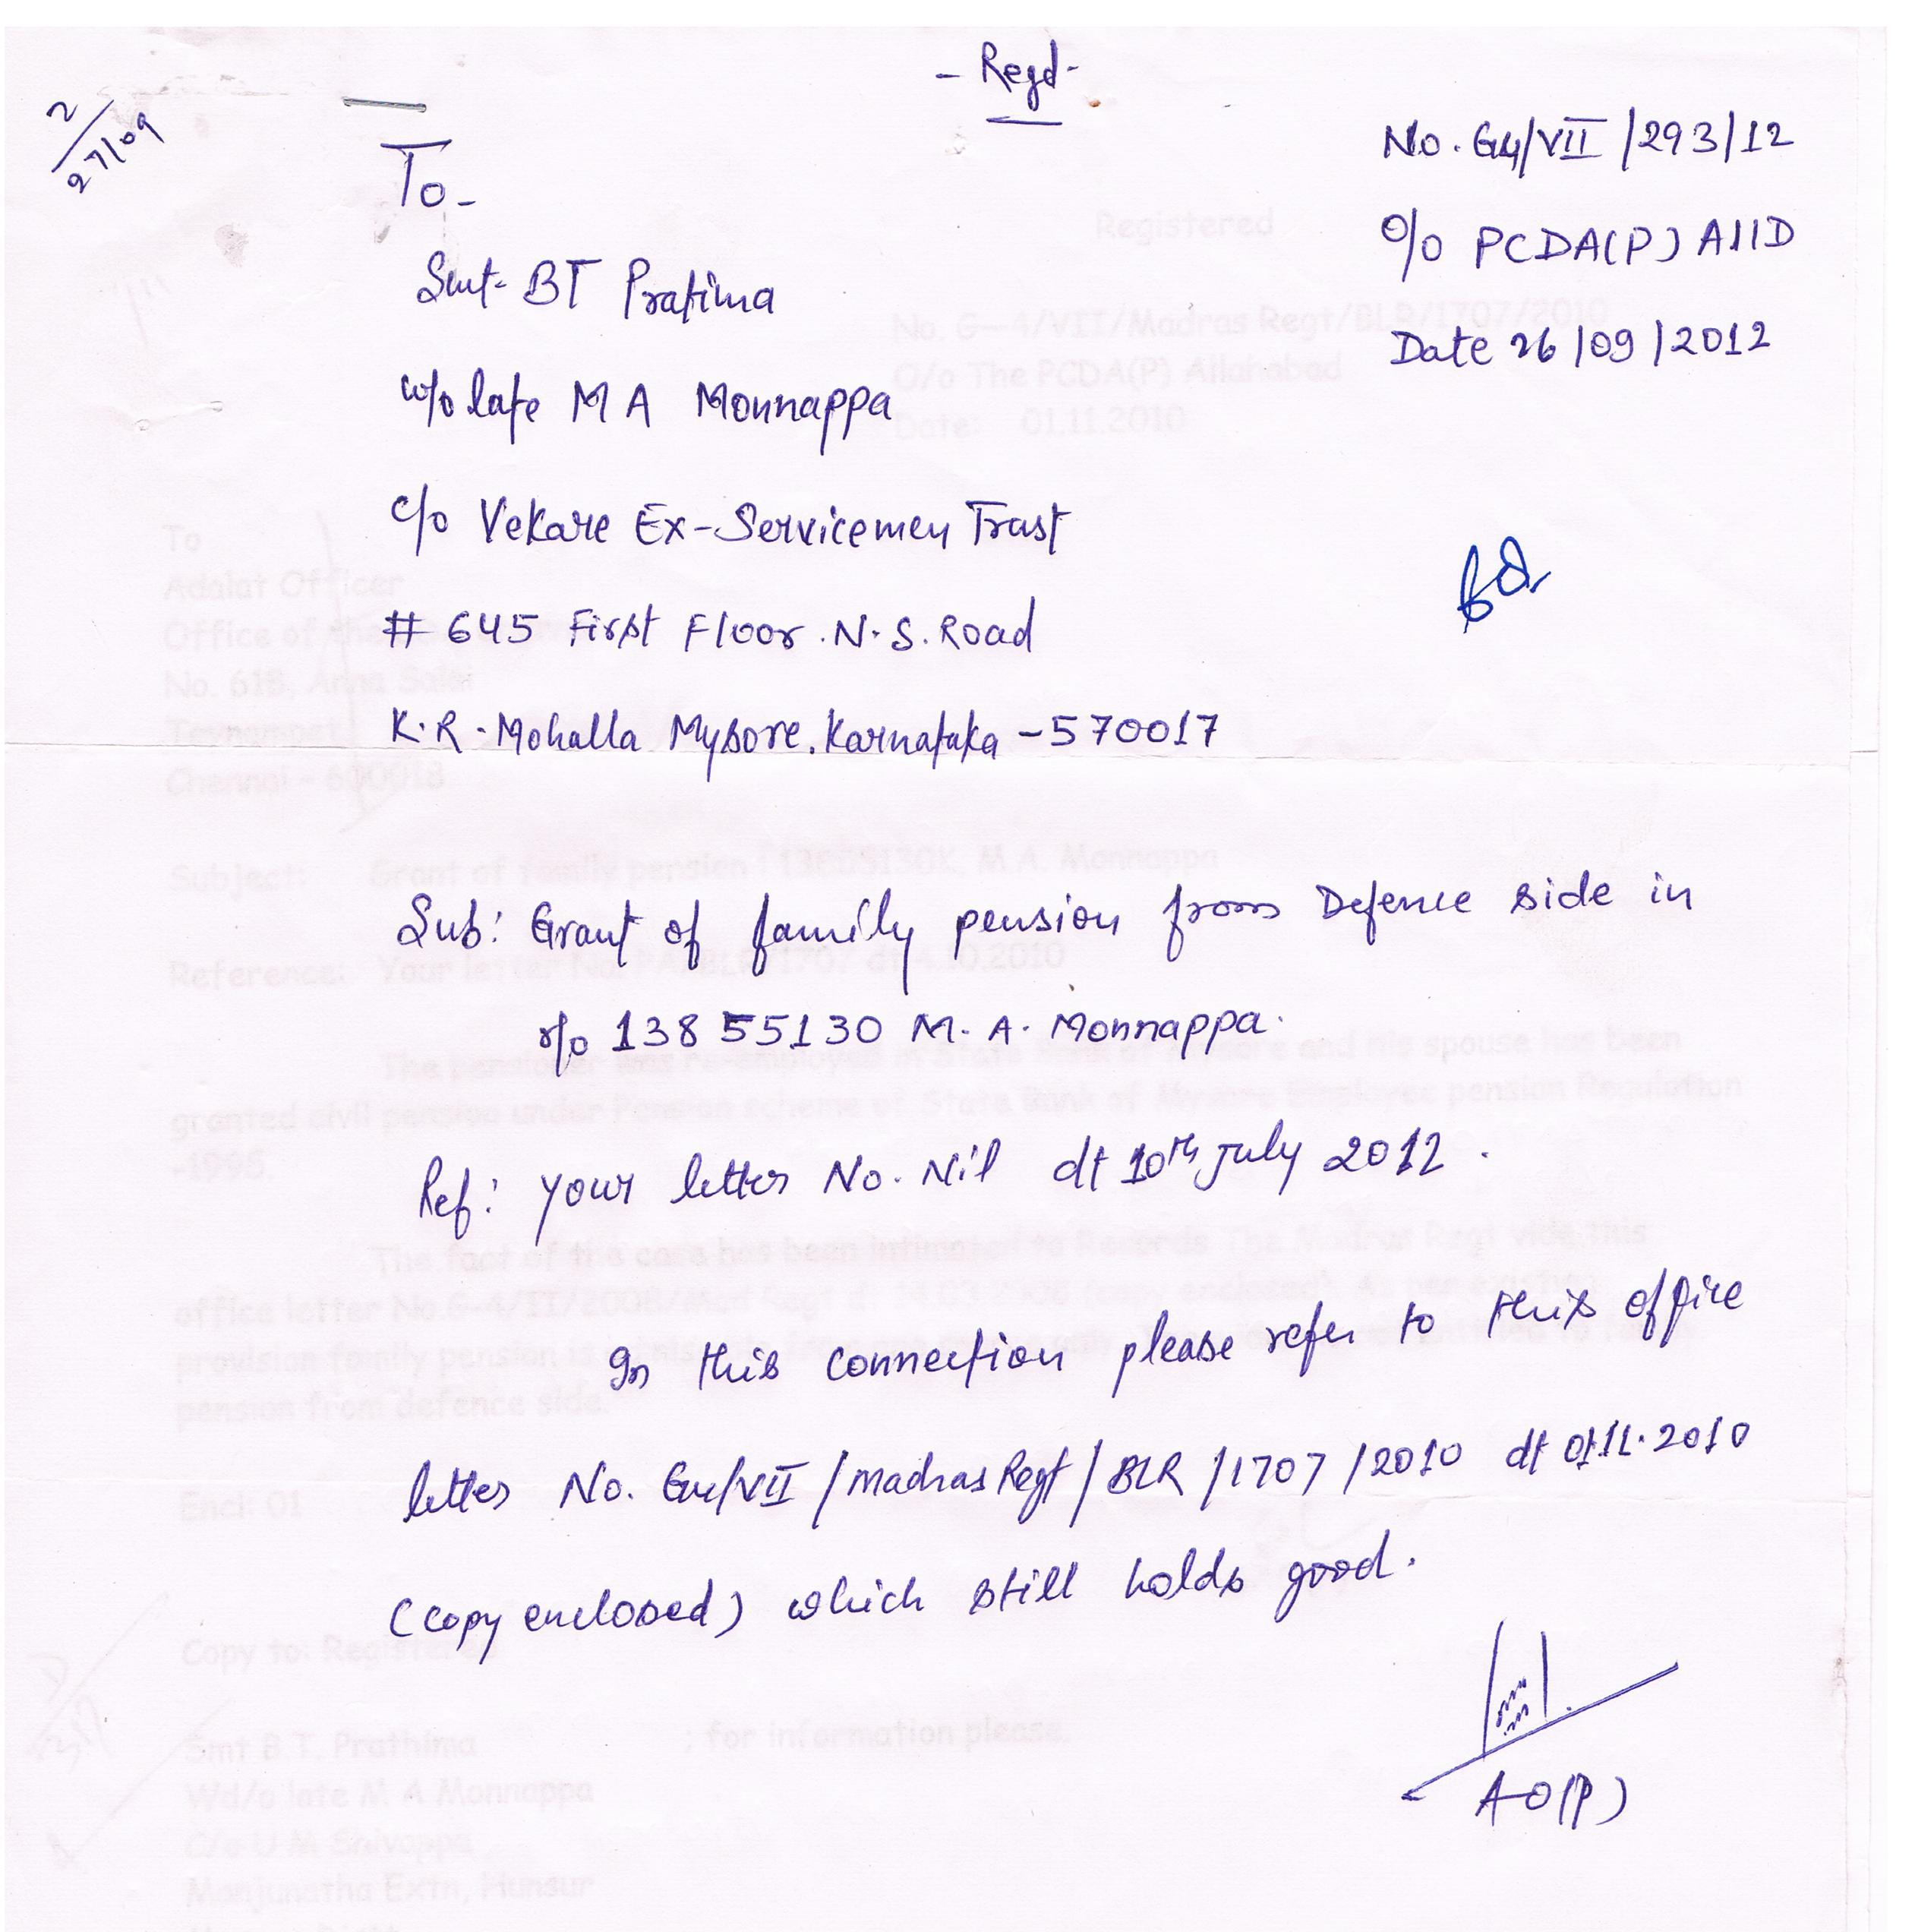 007 PCDA(P) Reply Ltr 26.09.2012